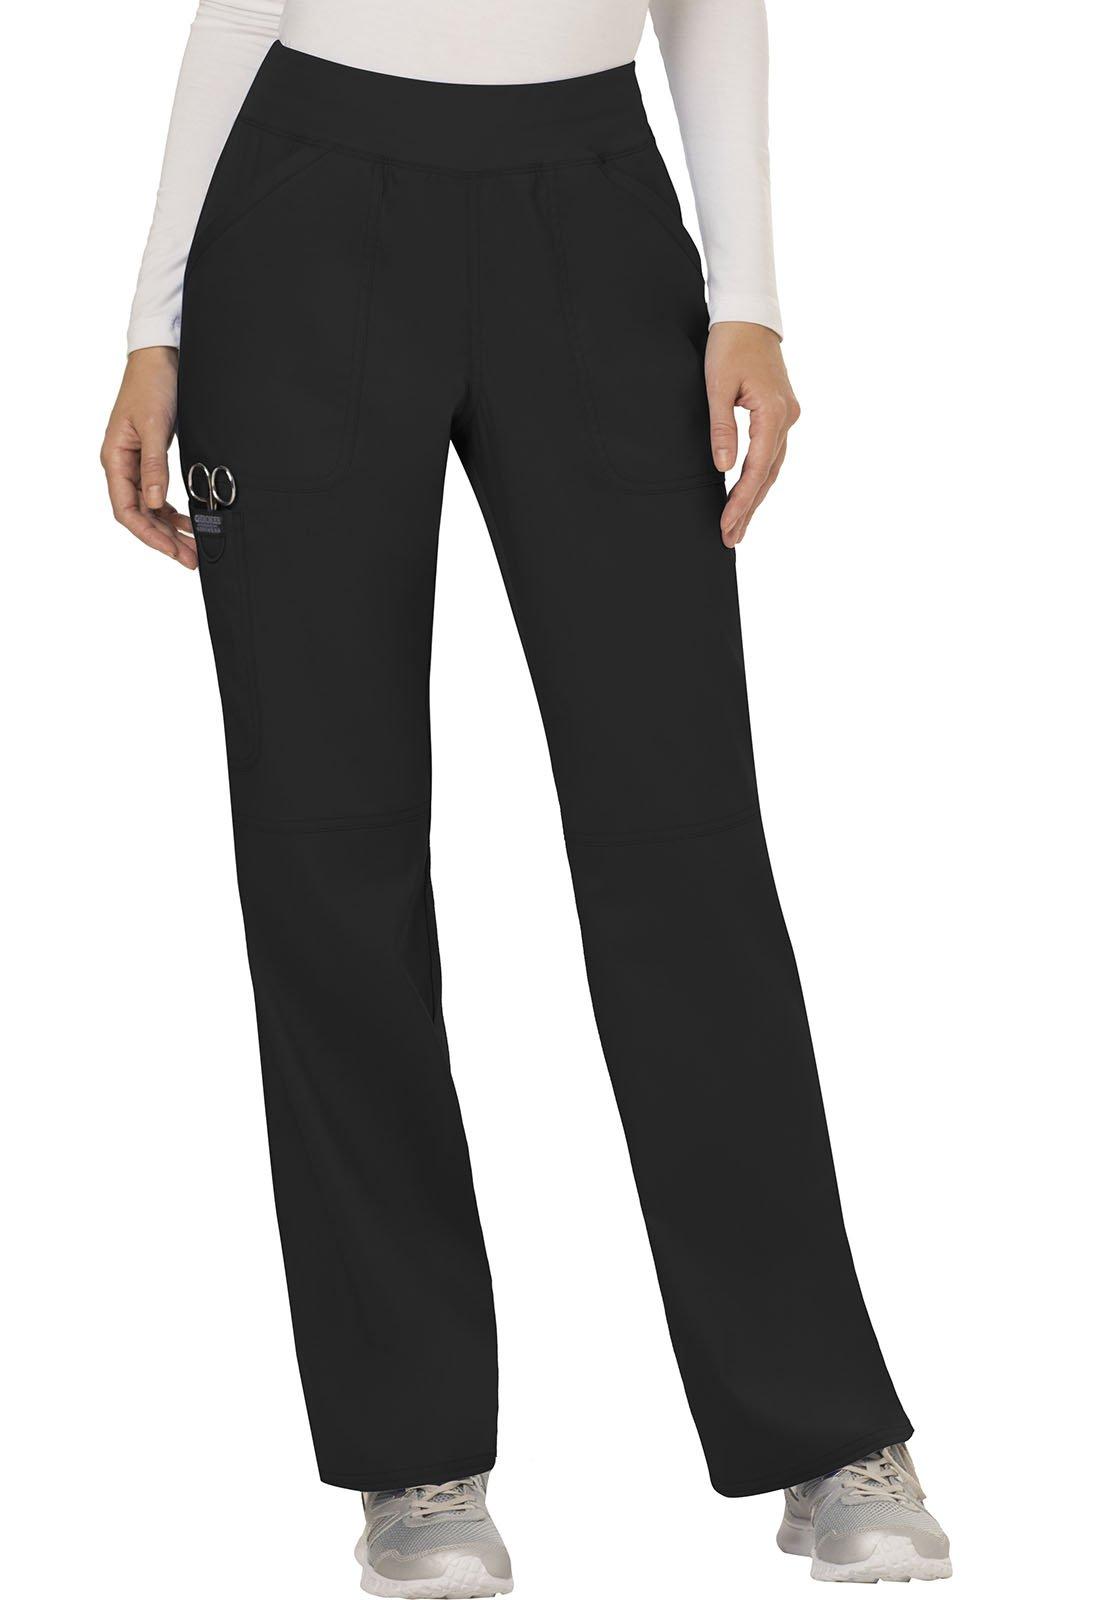 WW Revolution by Cherokee Women's Mid Rise Straight Leg Pull-on Pant, Black, 3XL